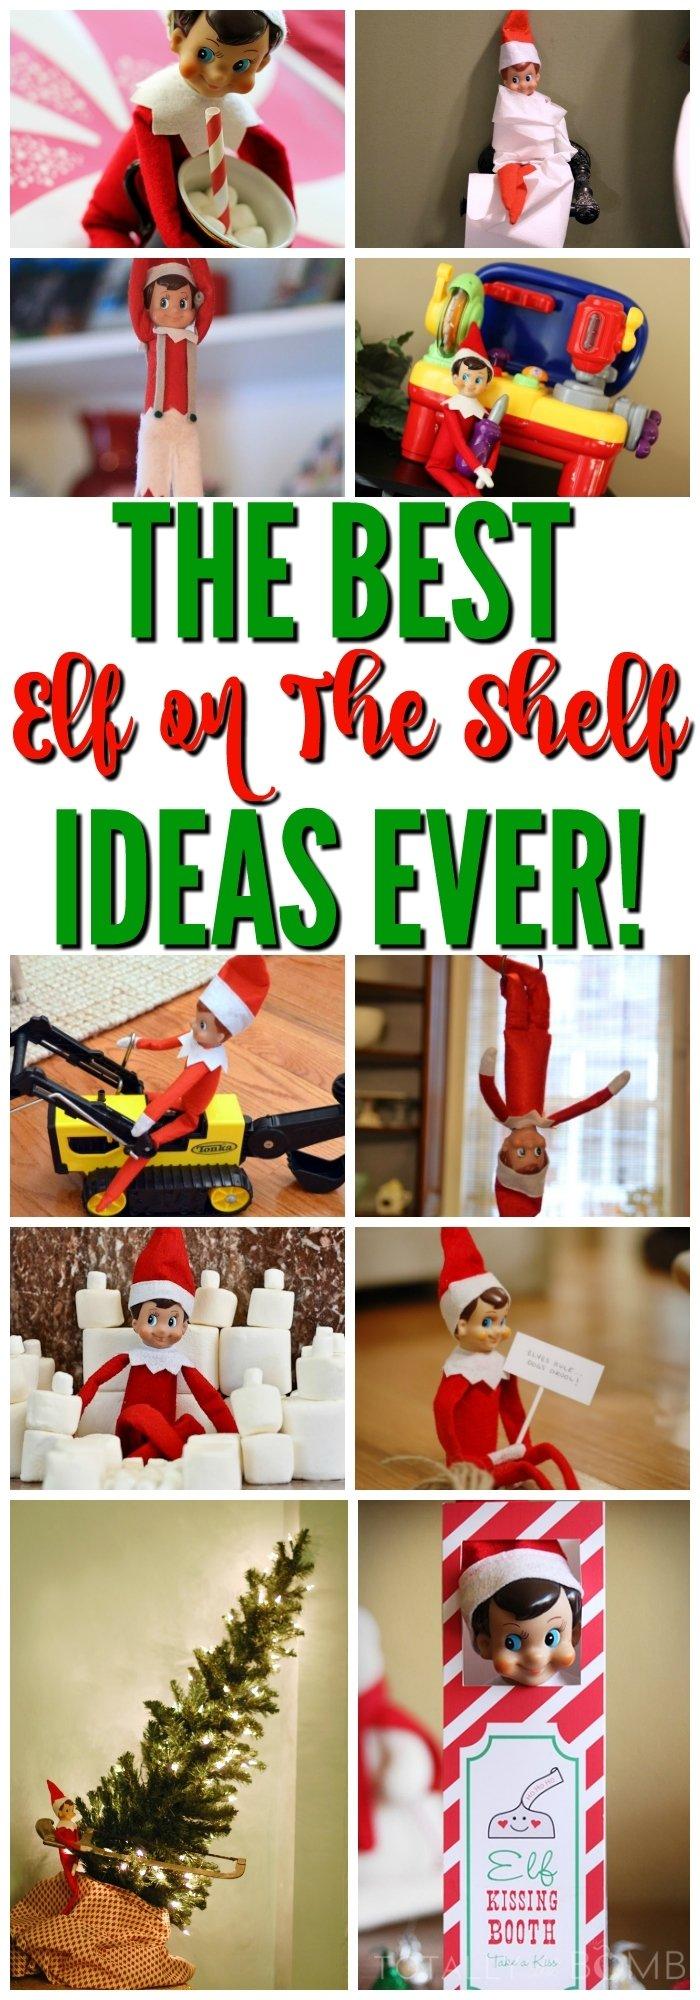 10 Elegant Elf On A Shelf Ideas 30 totally genius and easy elf on the shelf ideas 5